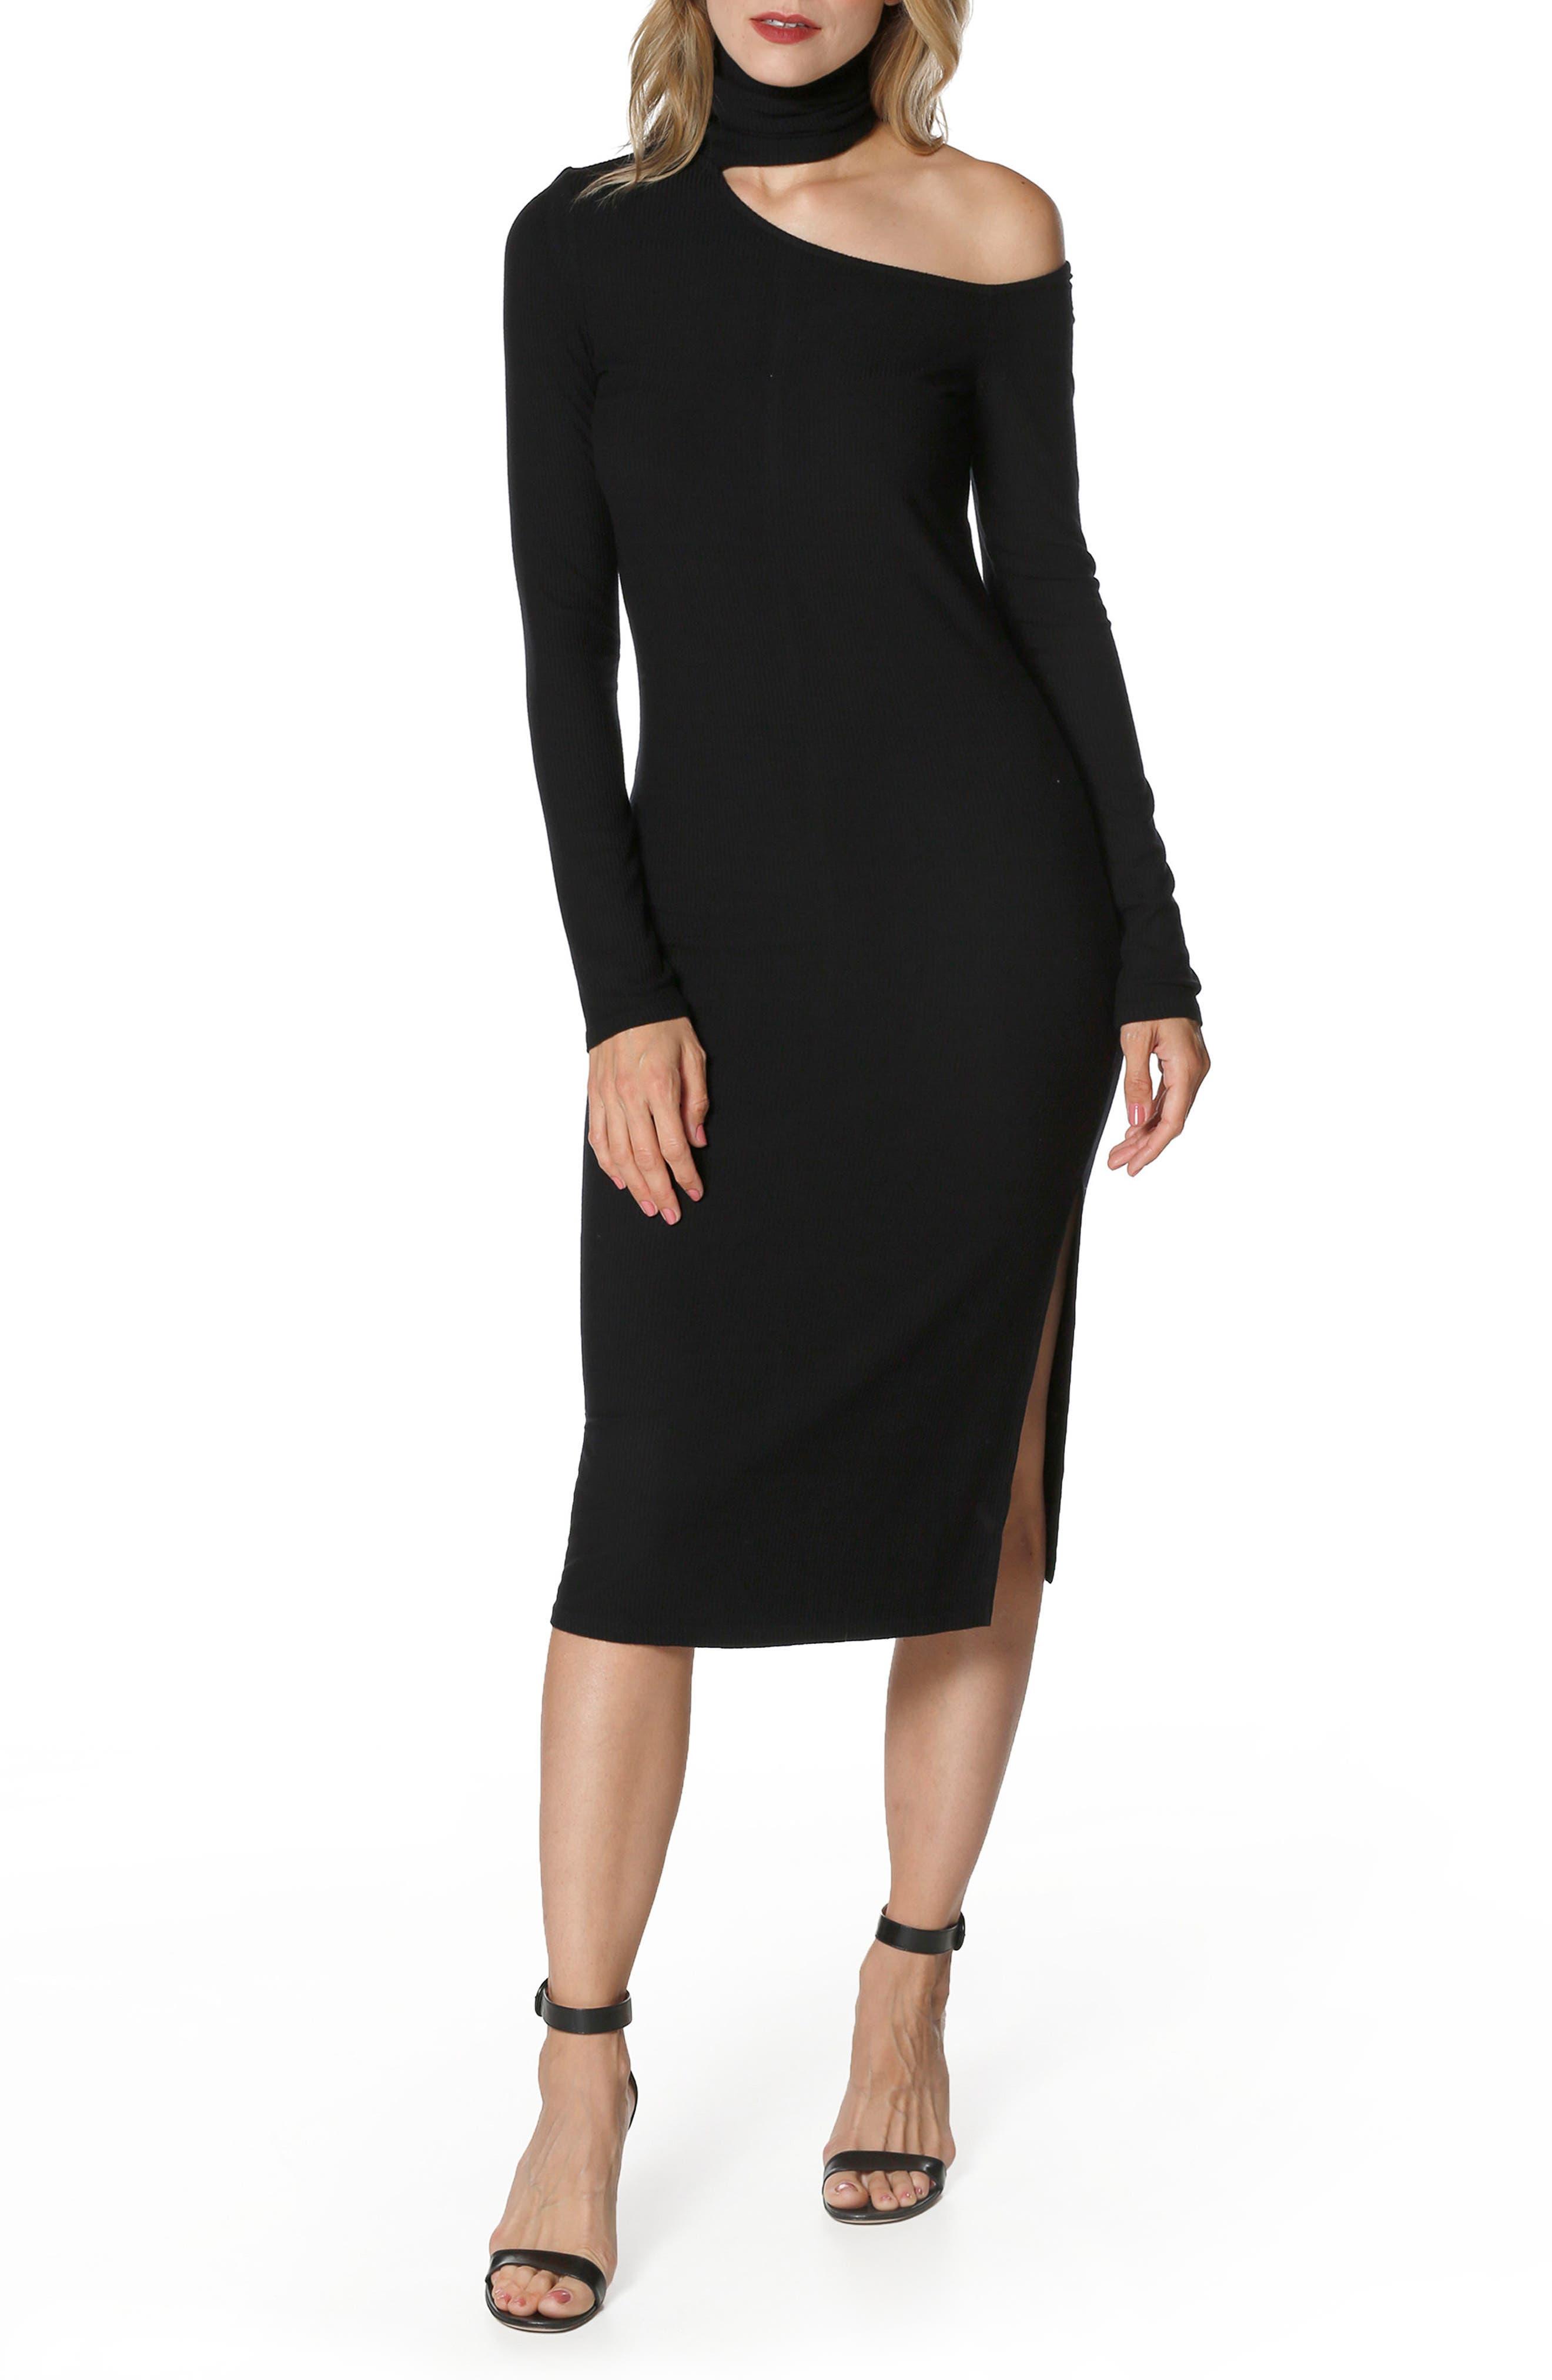 Alternate Image 1 Selected - PAIGE Faith Knit Cold Shoulder Dress